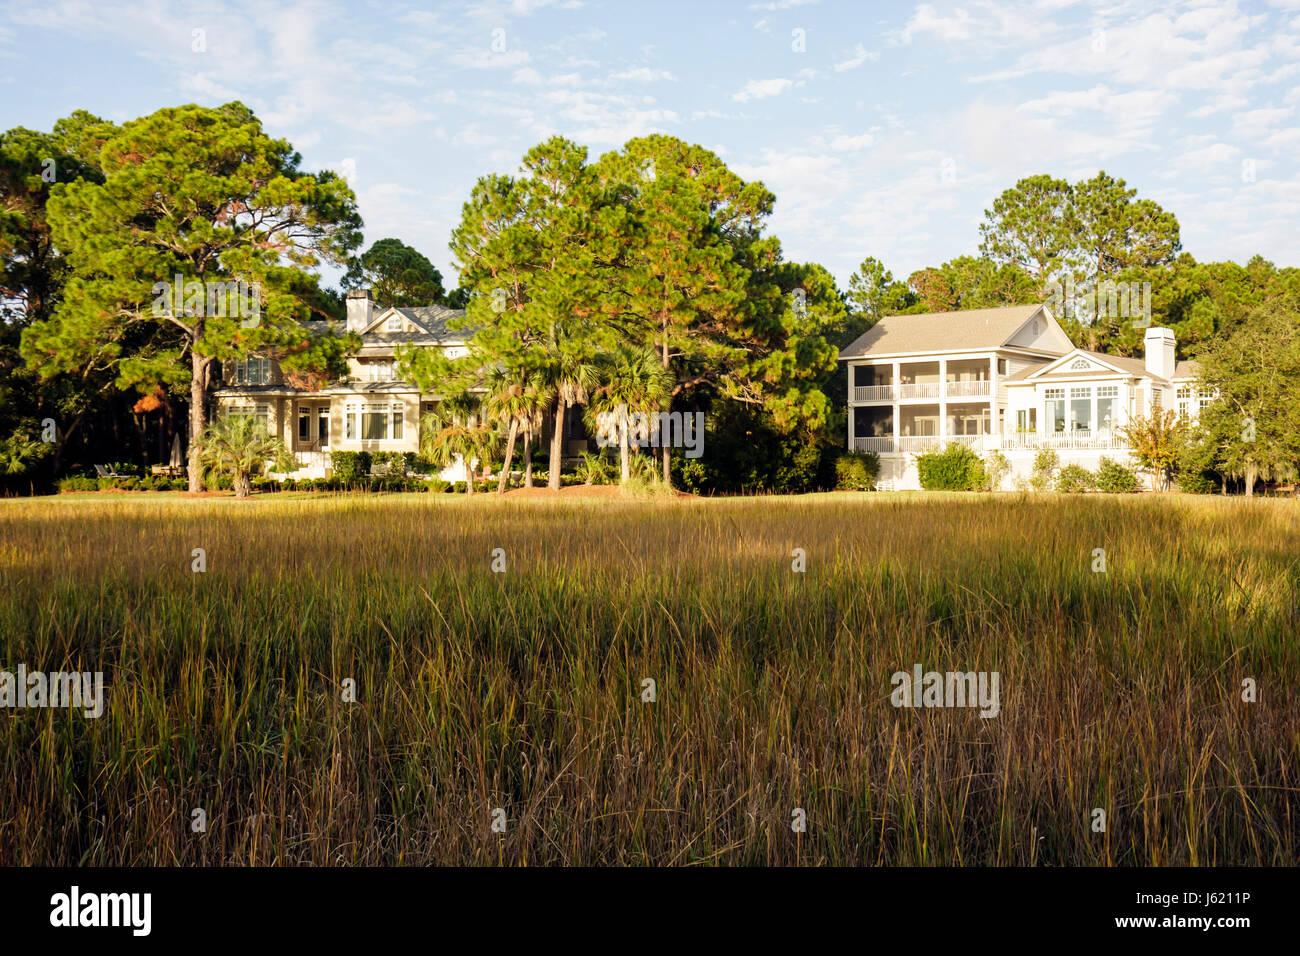 South Carolina Hilton Head Island Sea Pines Plantation South Beach resort single-family house home Low Country Architecture - Stock Image